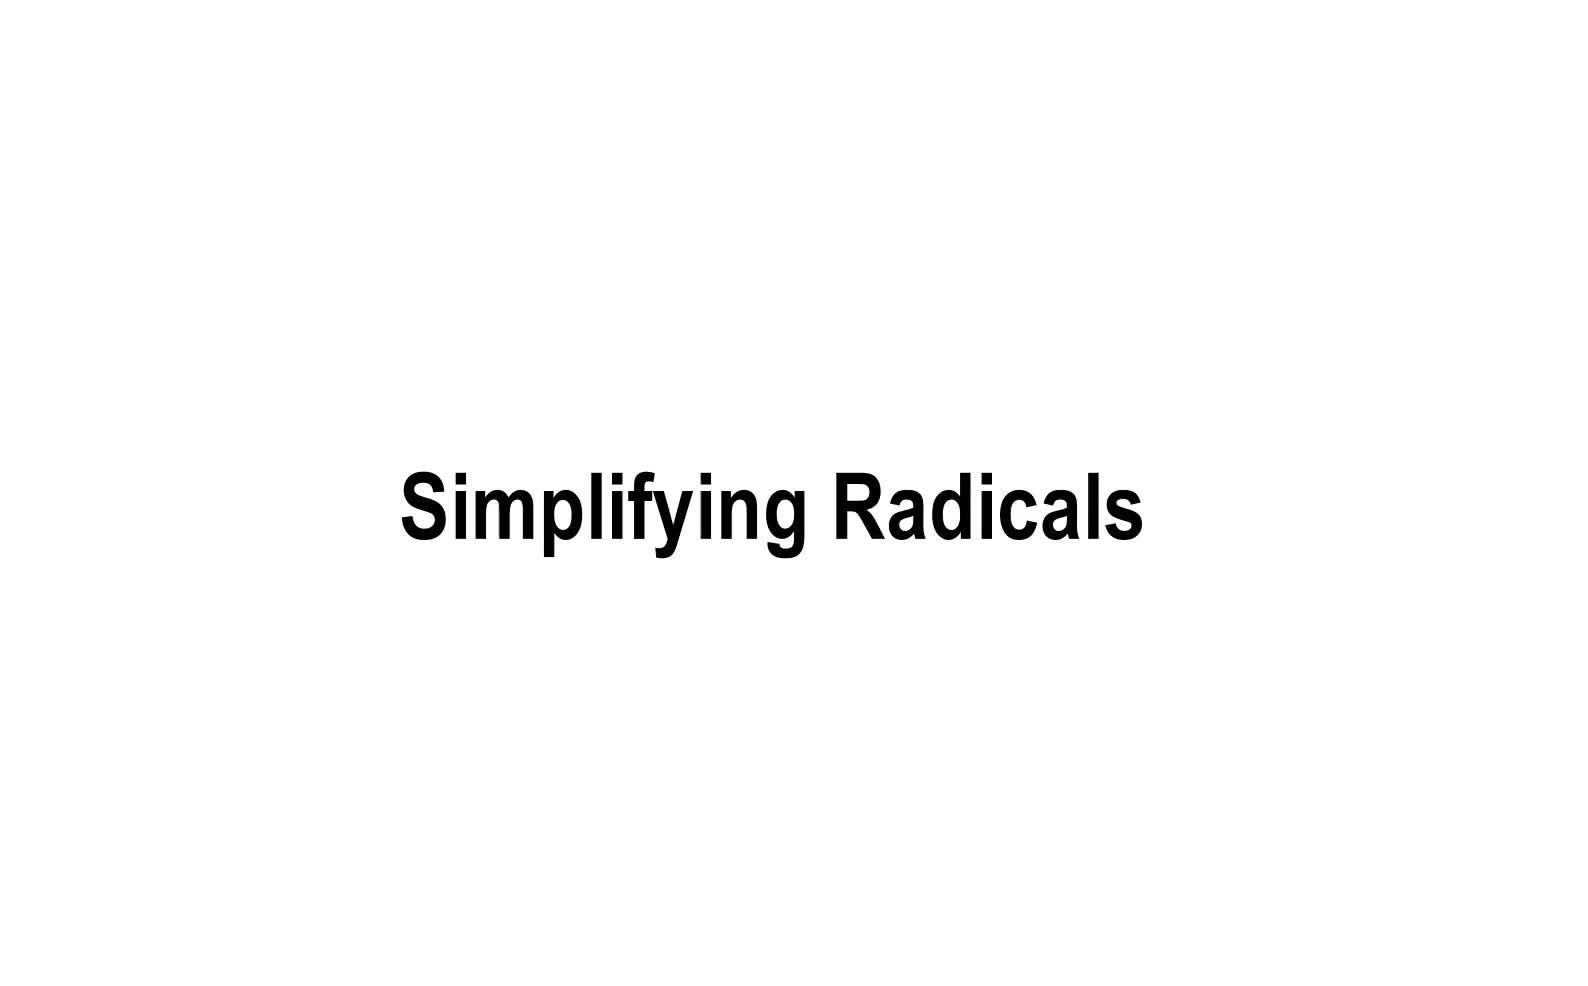 Simplifying Radicals and Quad Form